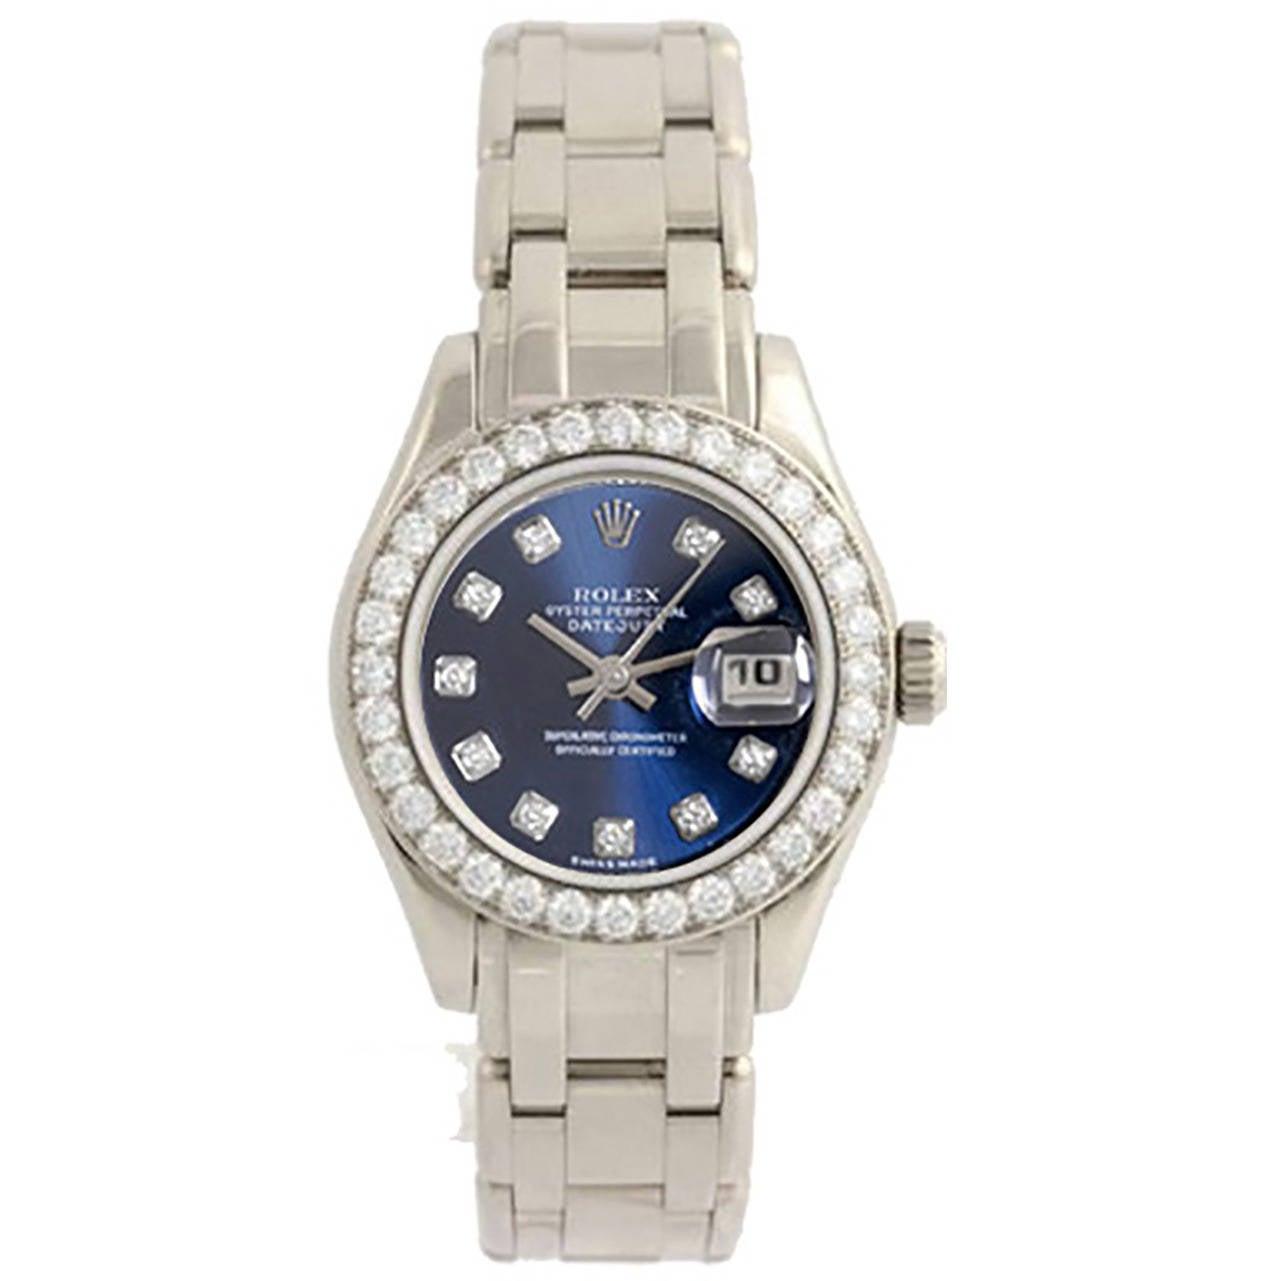 Rolex Lady's White Gold Diamond Pearlmaster Masterpiece Wristwatch Ref 80299 1